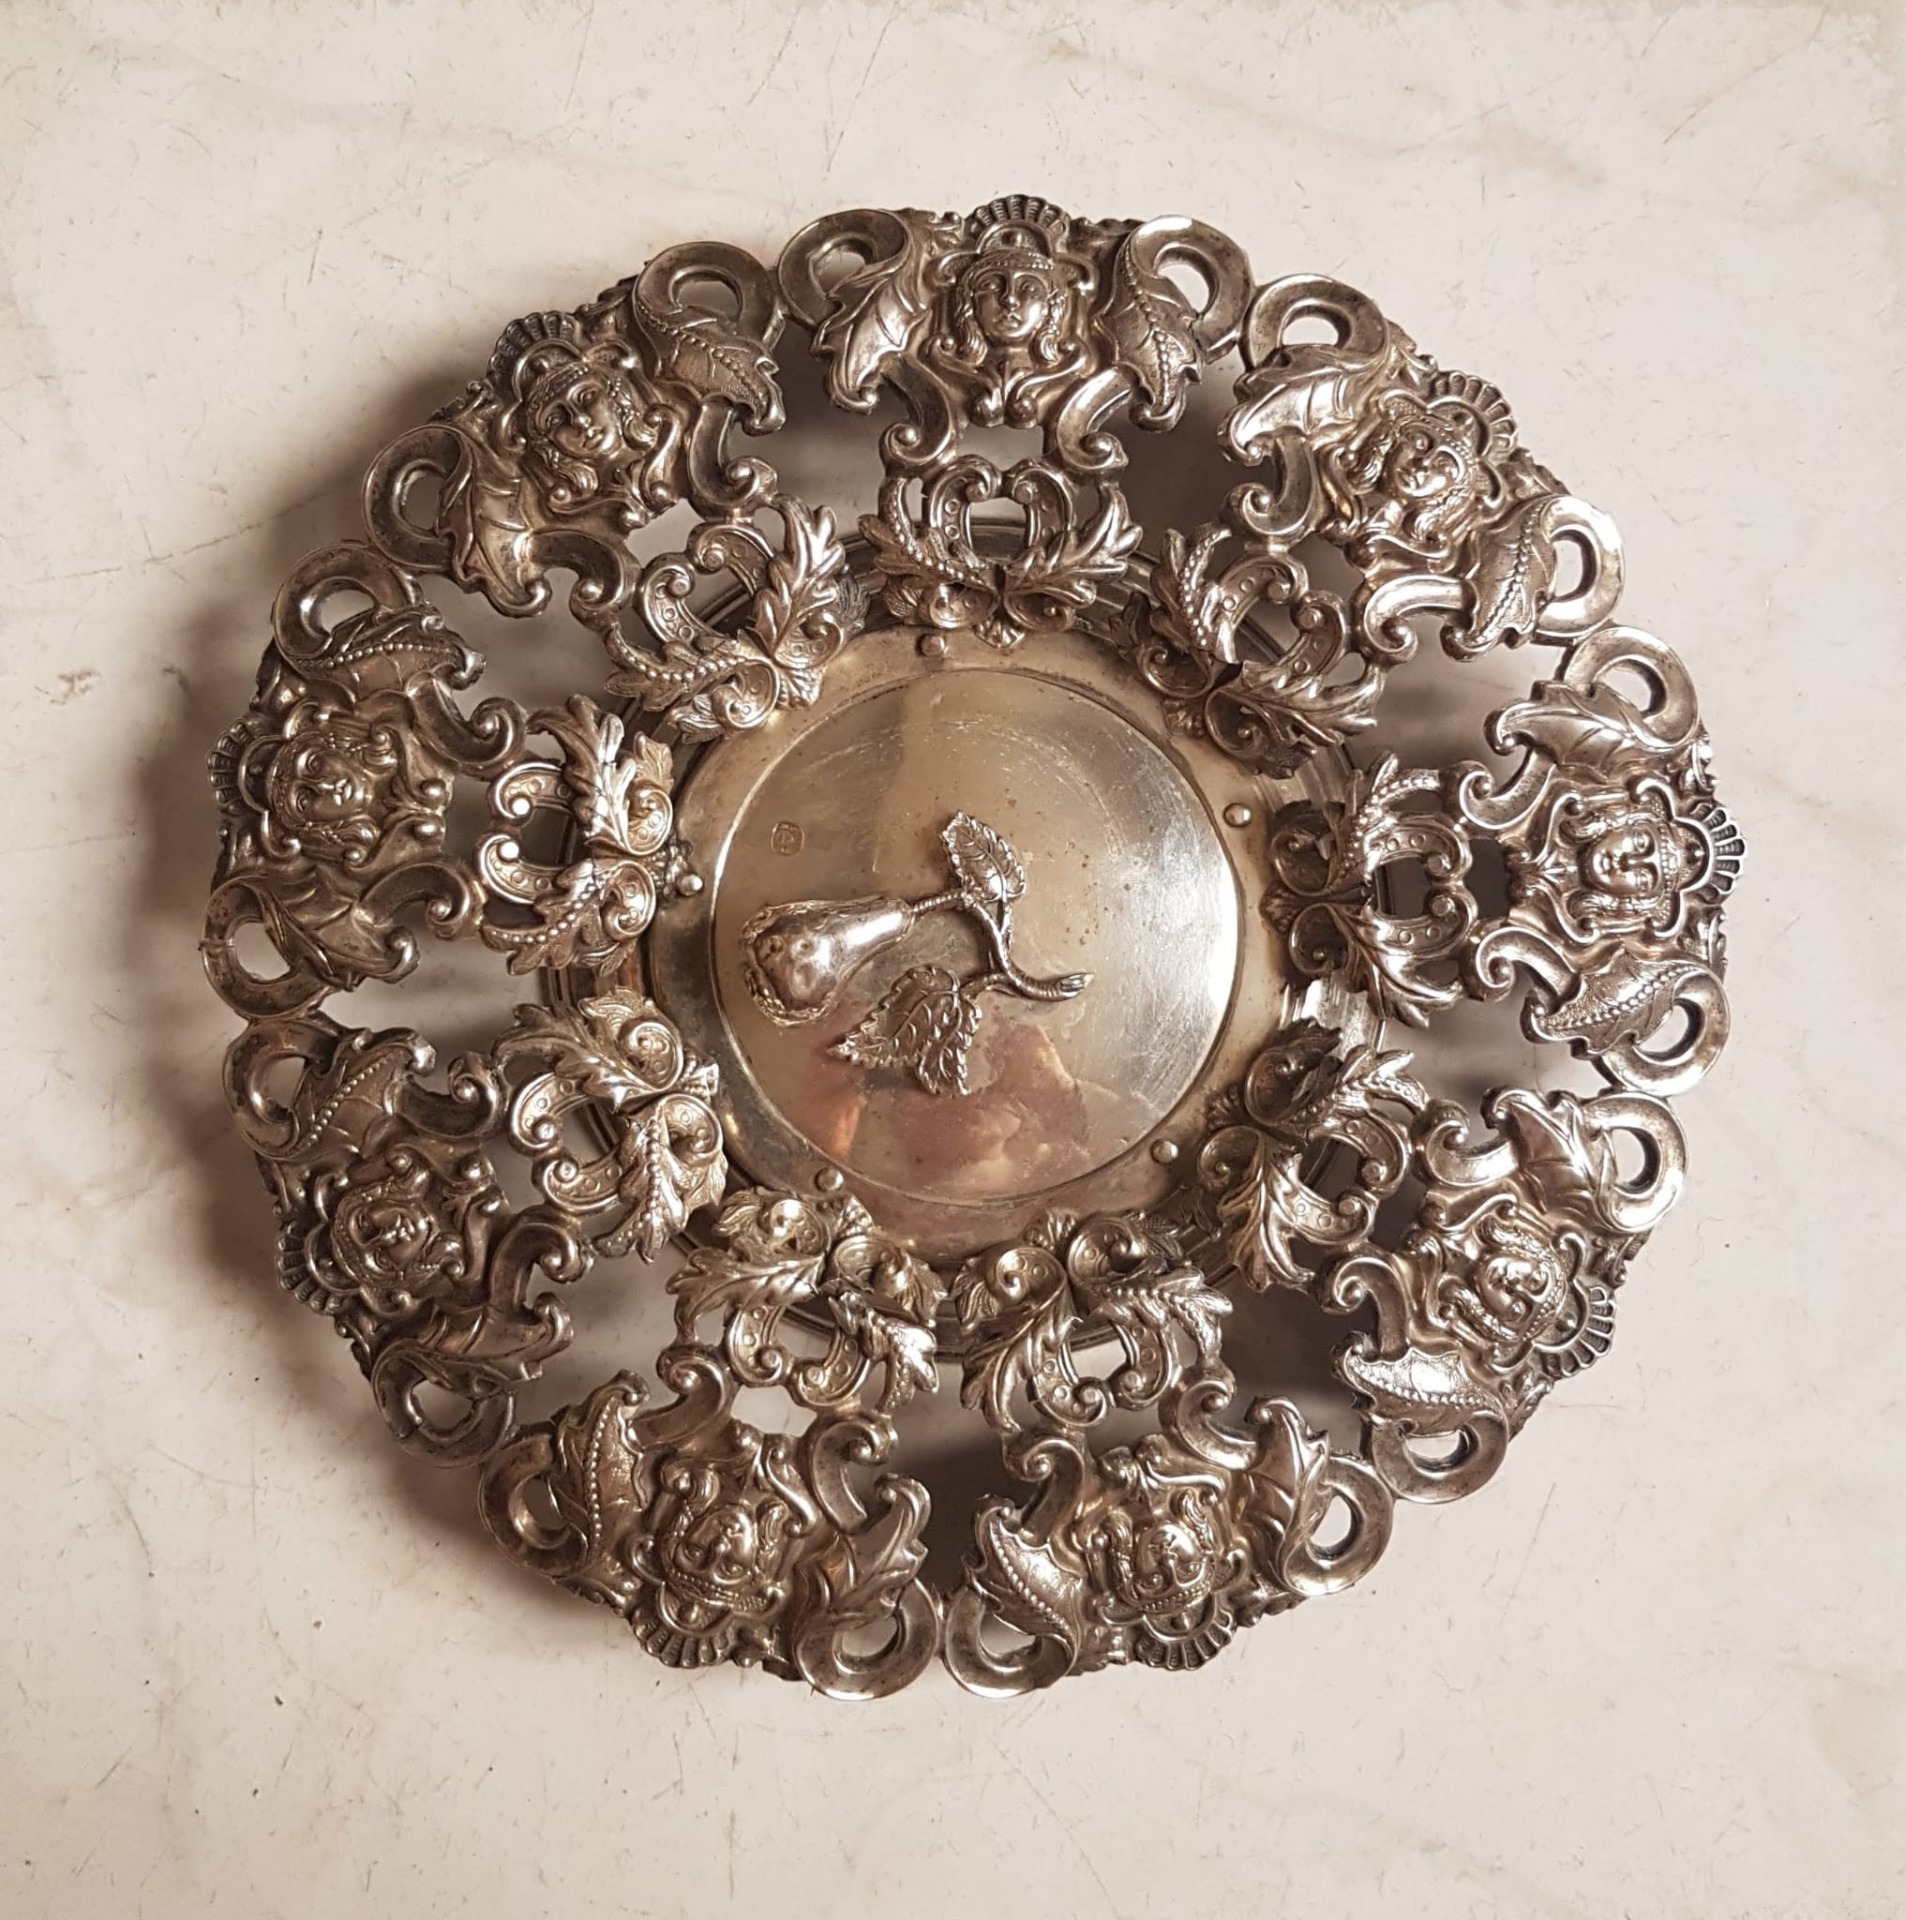 thumb2|Ornamental Tischdekoration